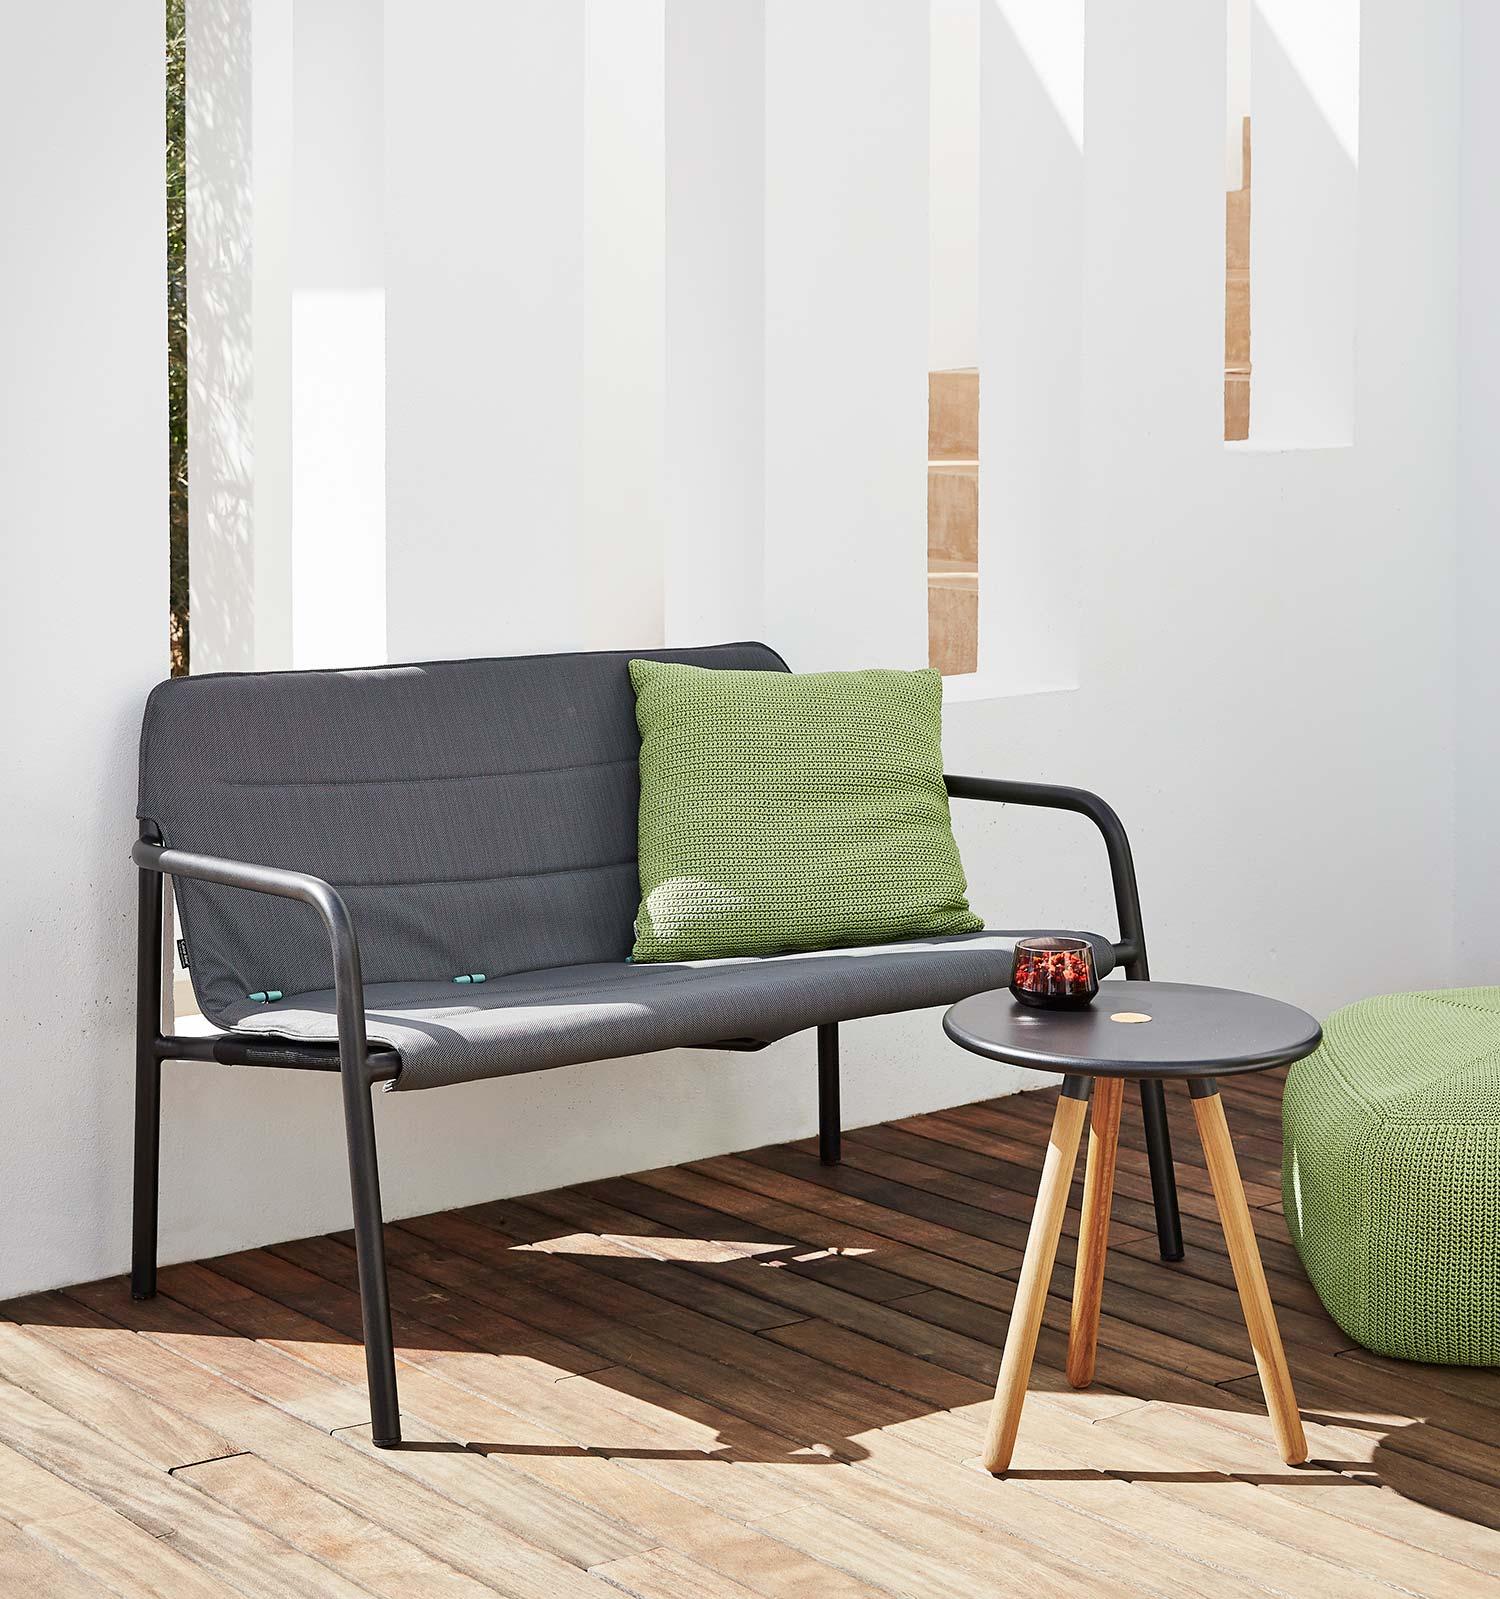 Kapa soffa från Cane-line i grå Cane-line Tex.